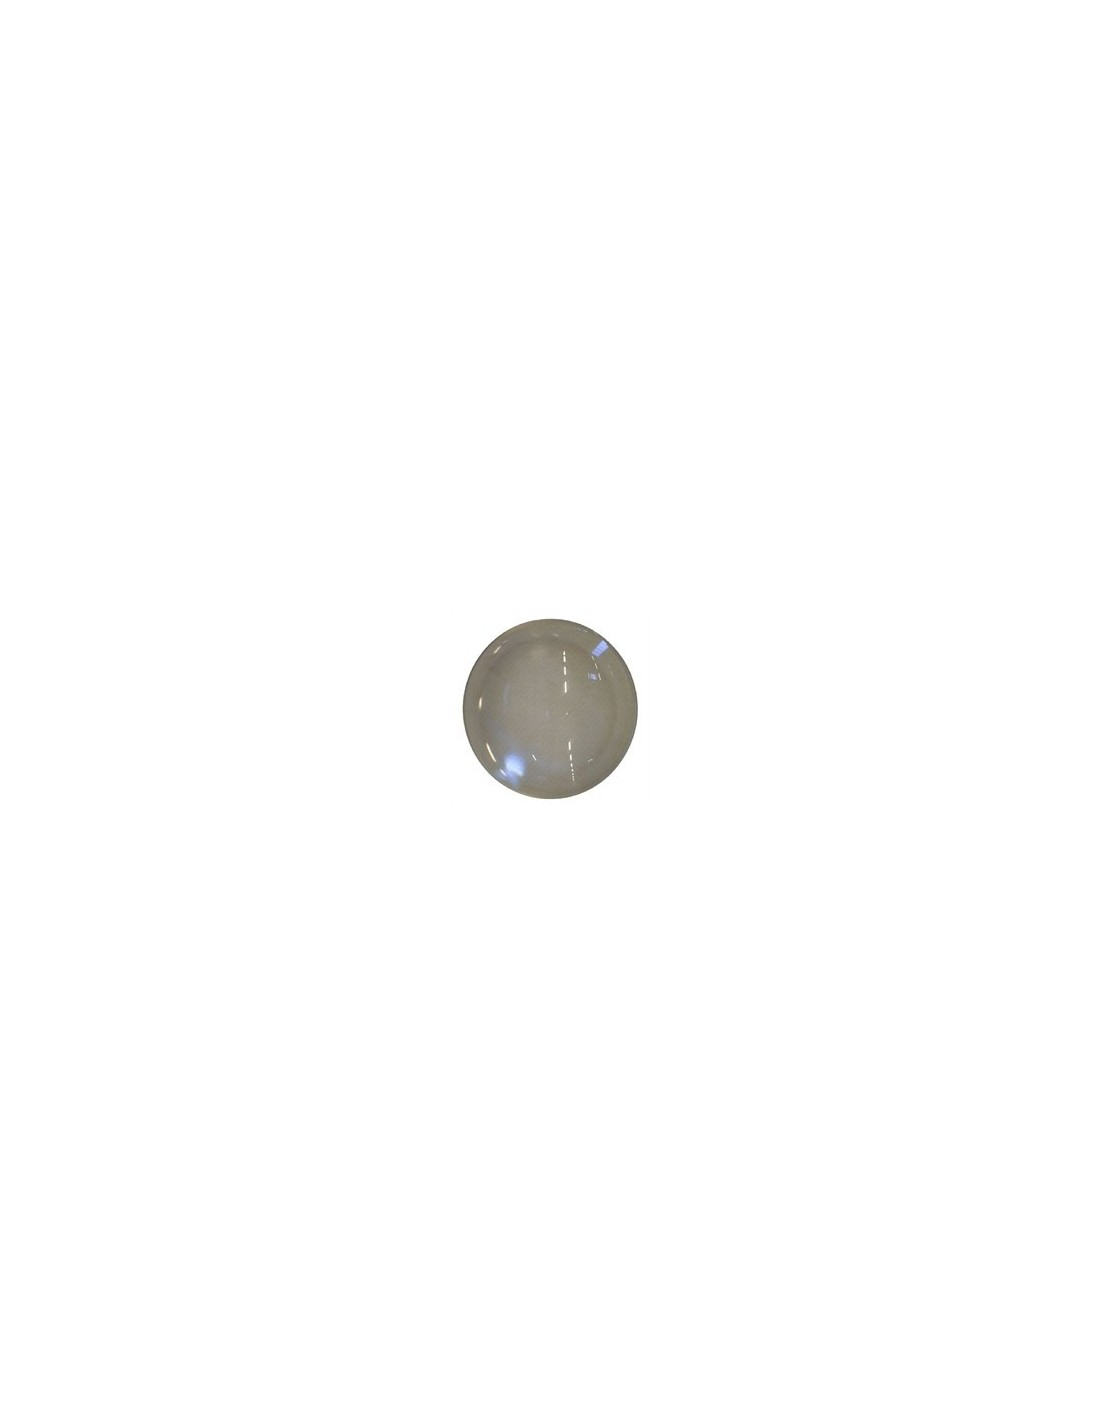 UPP00095 - Frogeyelins/emblem blank 81mm